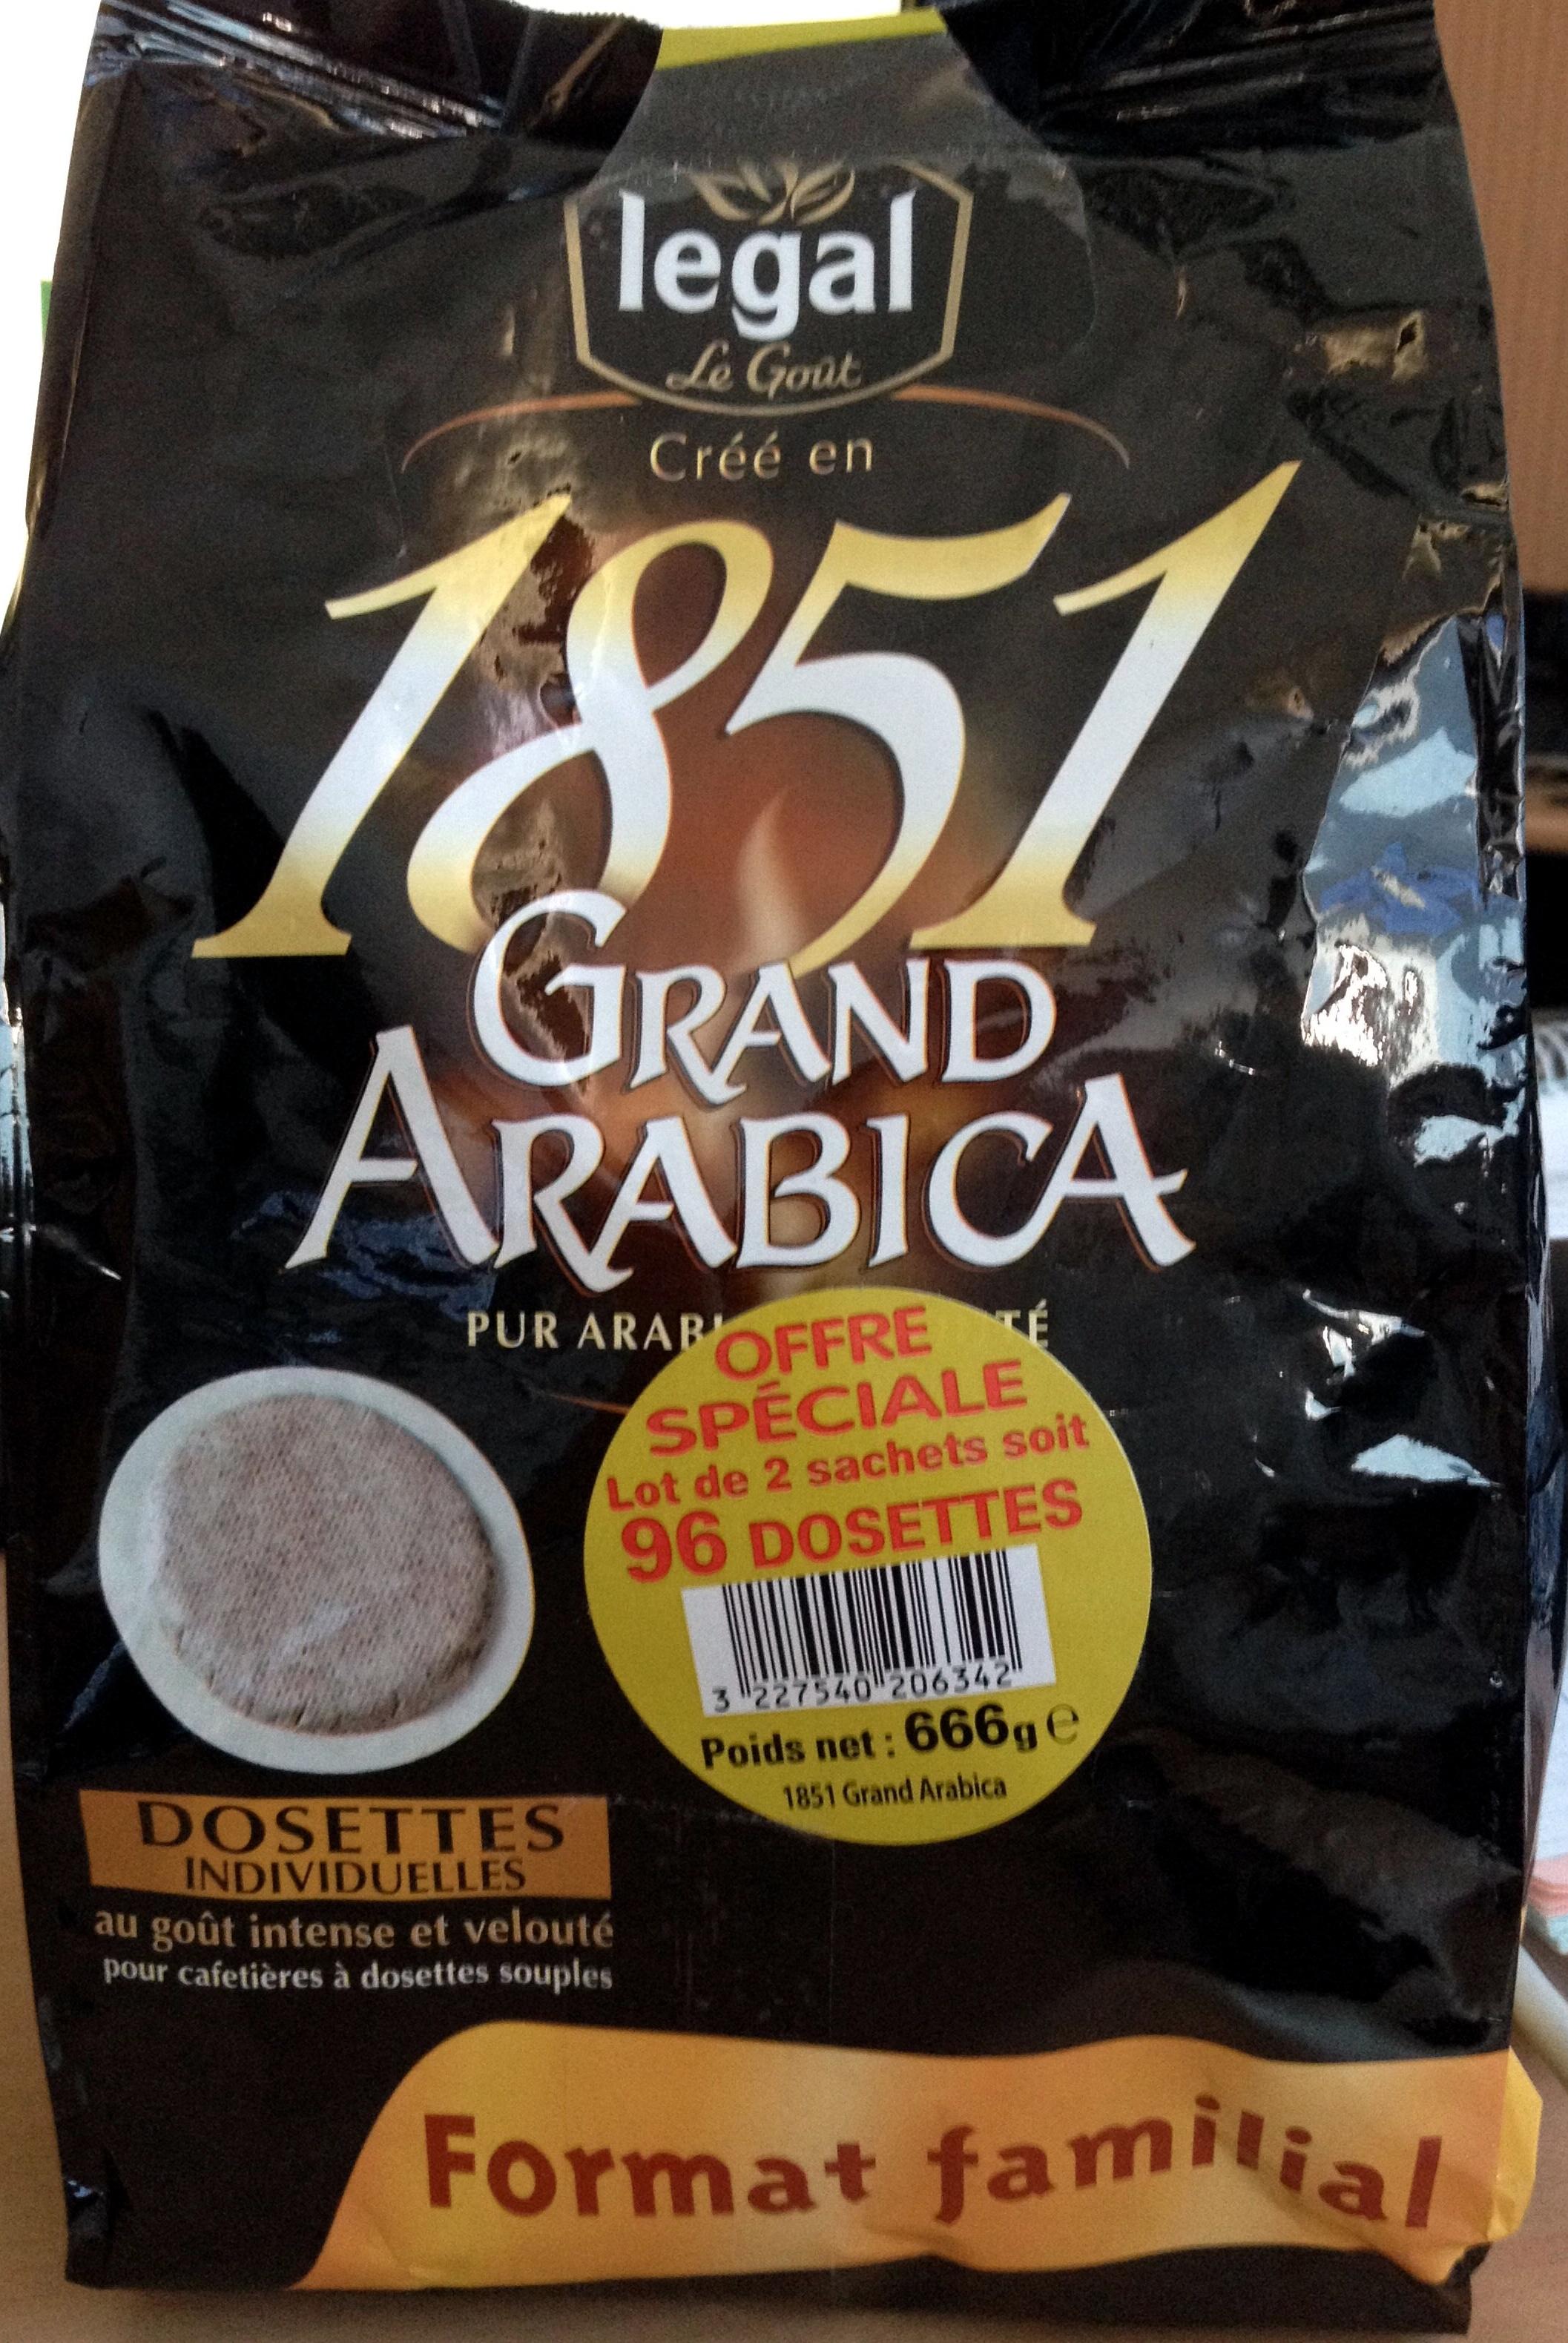 1851 Grand Arabica - Product - fr